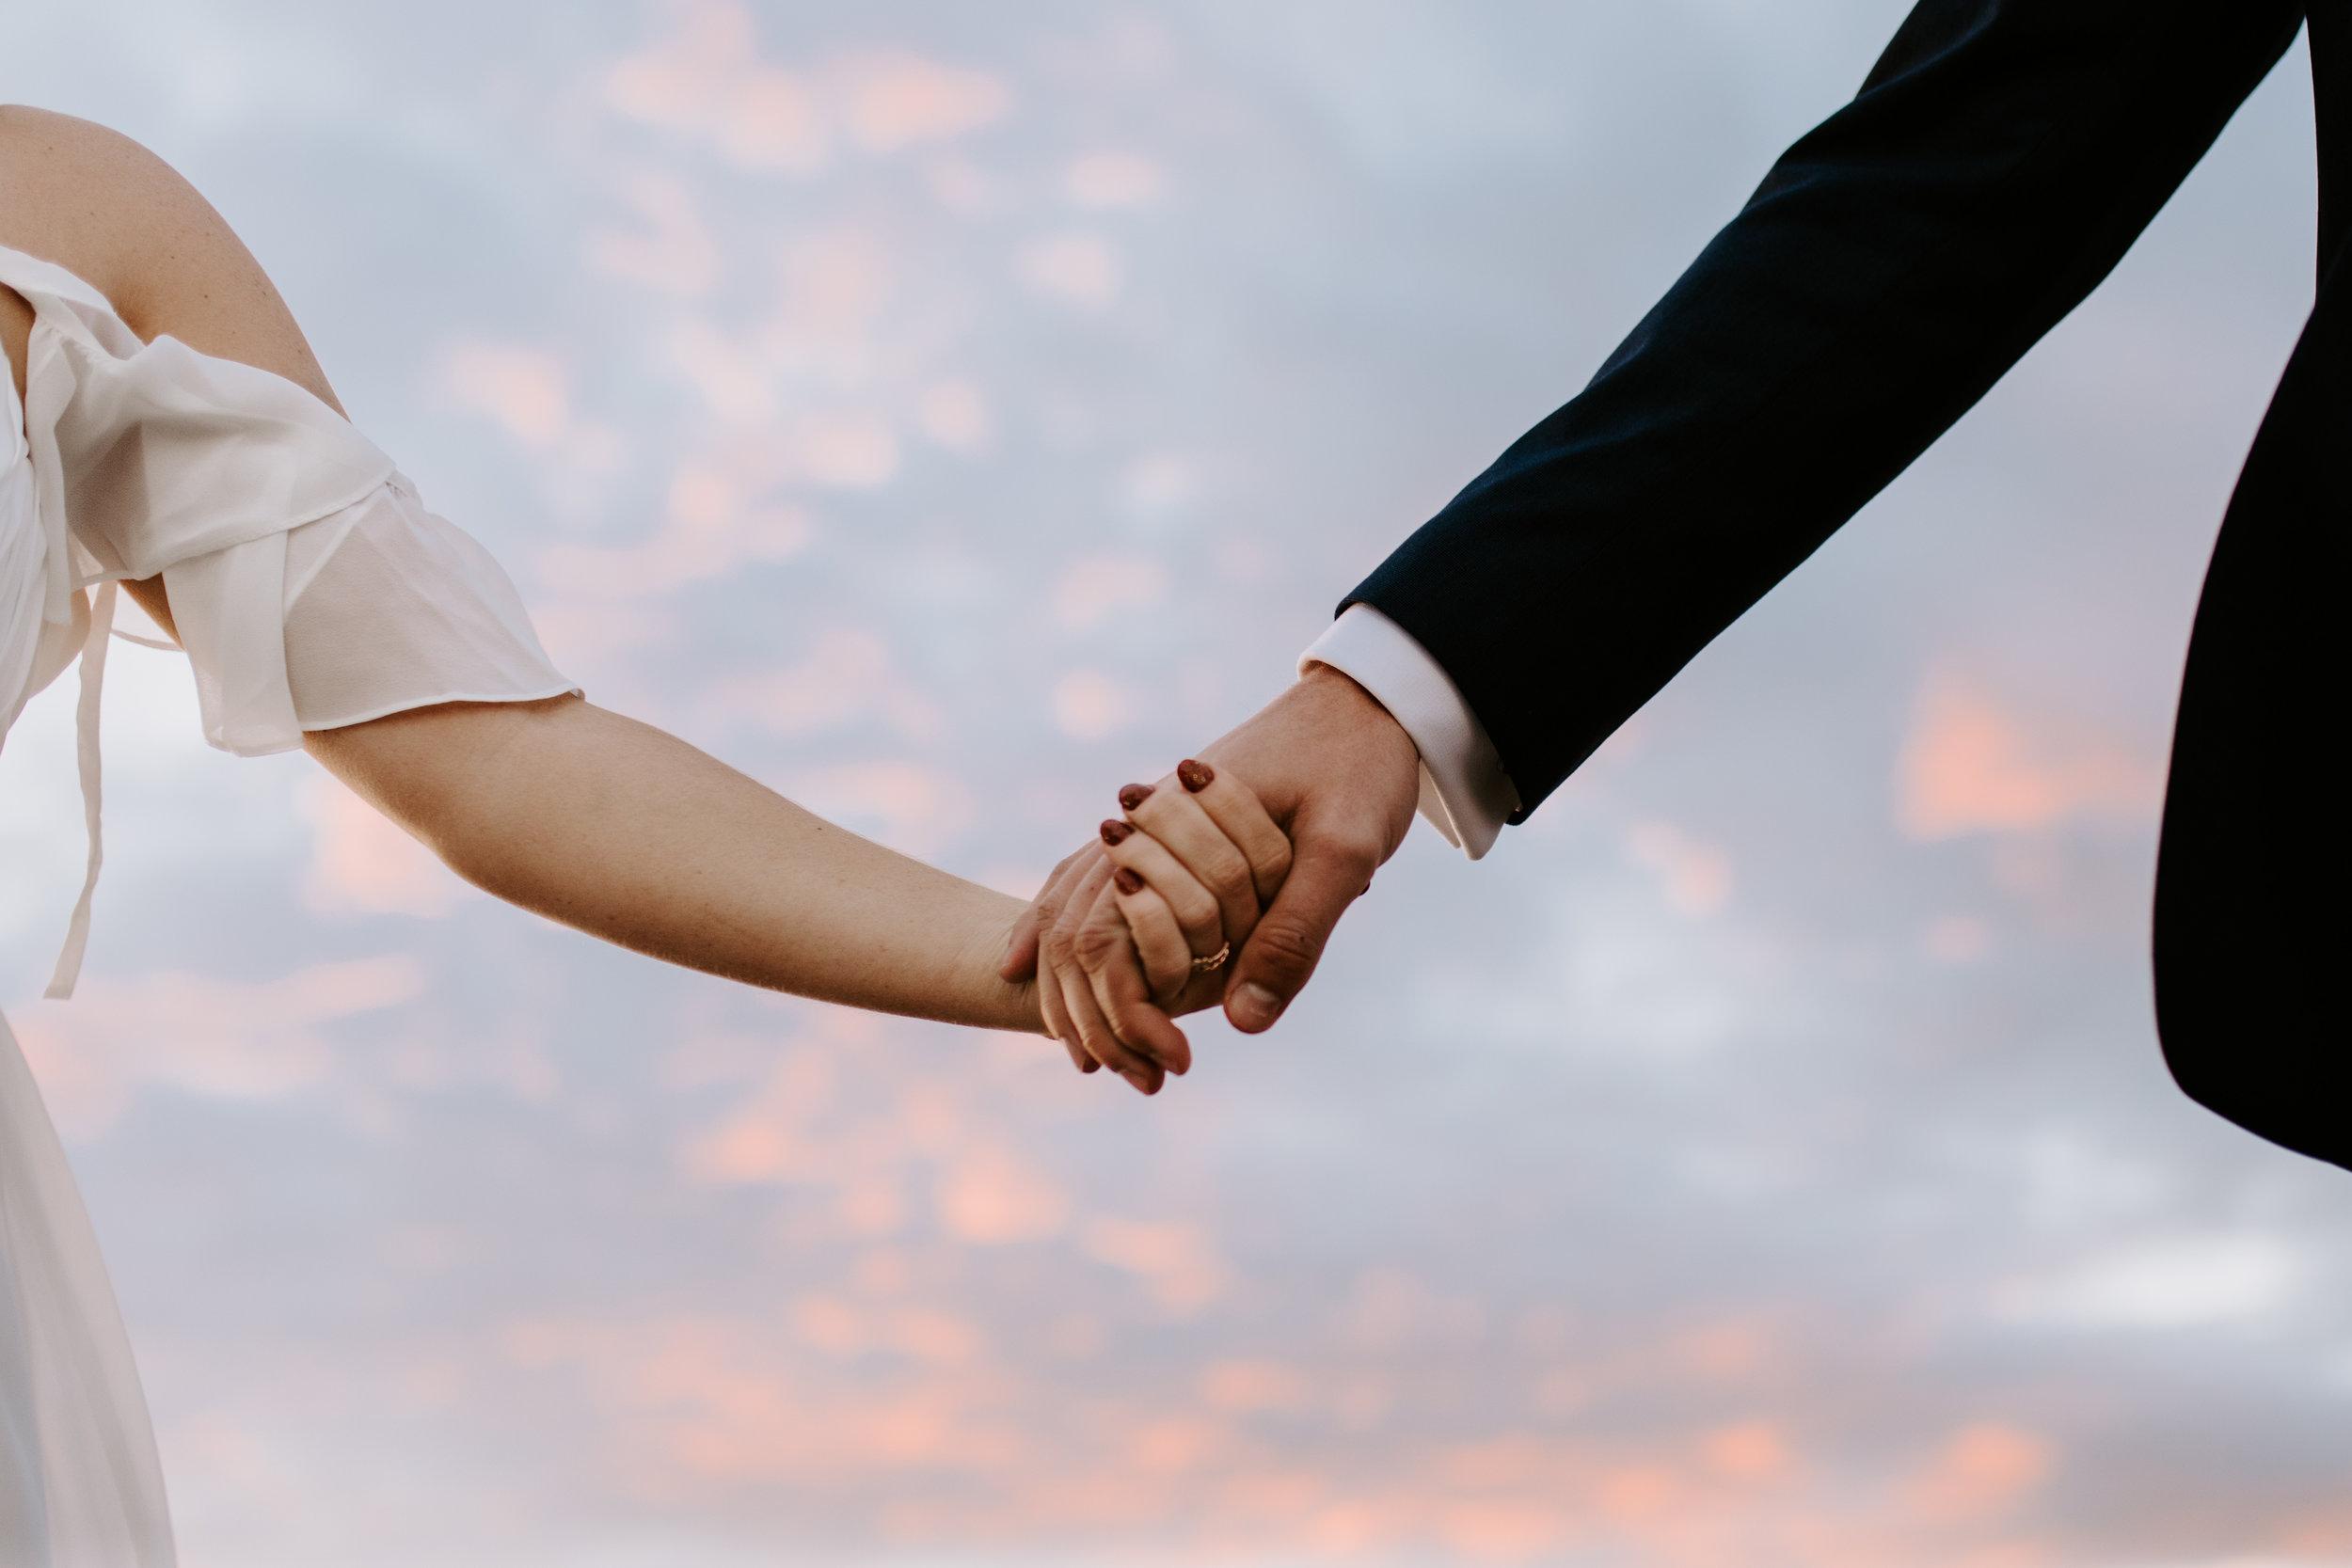 Pink Sky Holding Hands